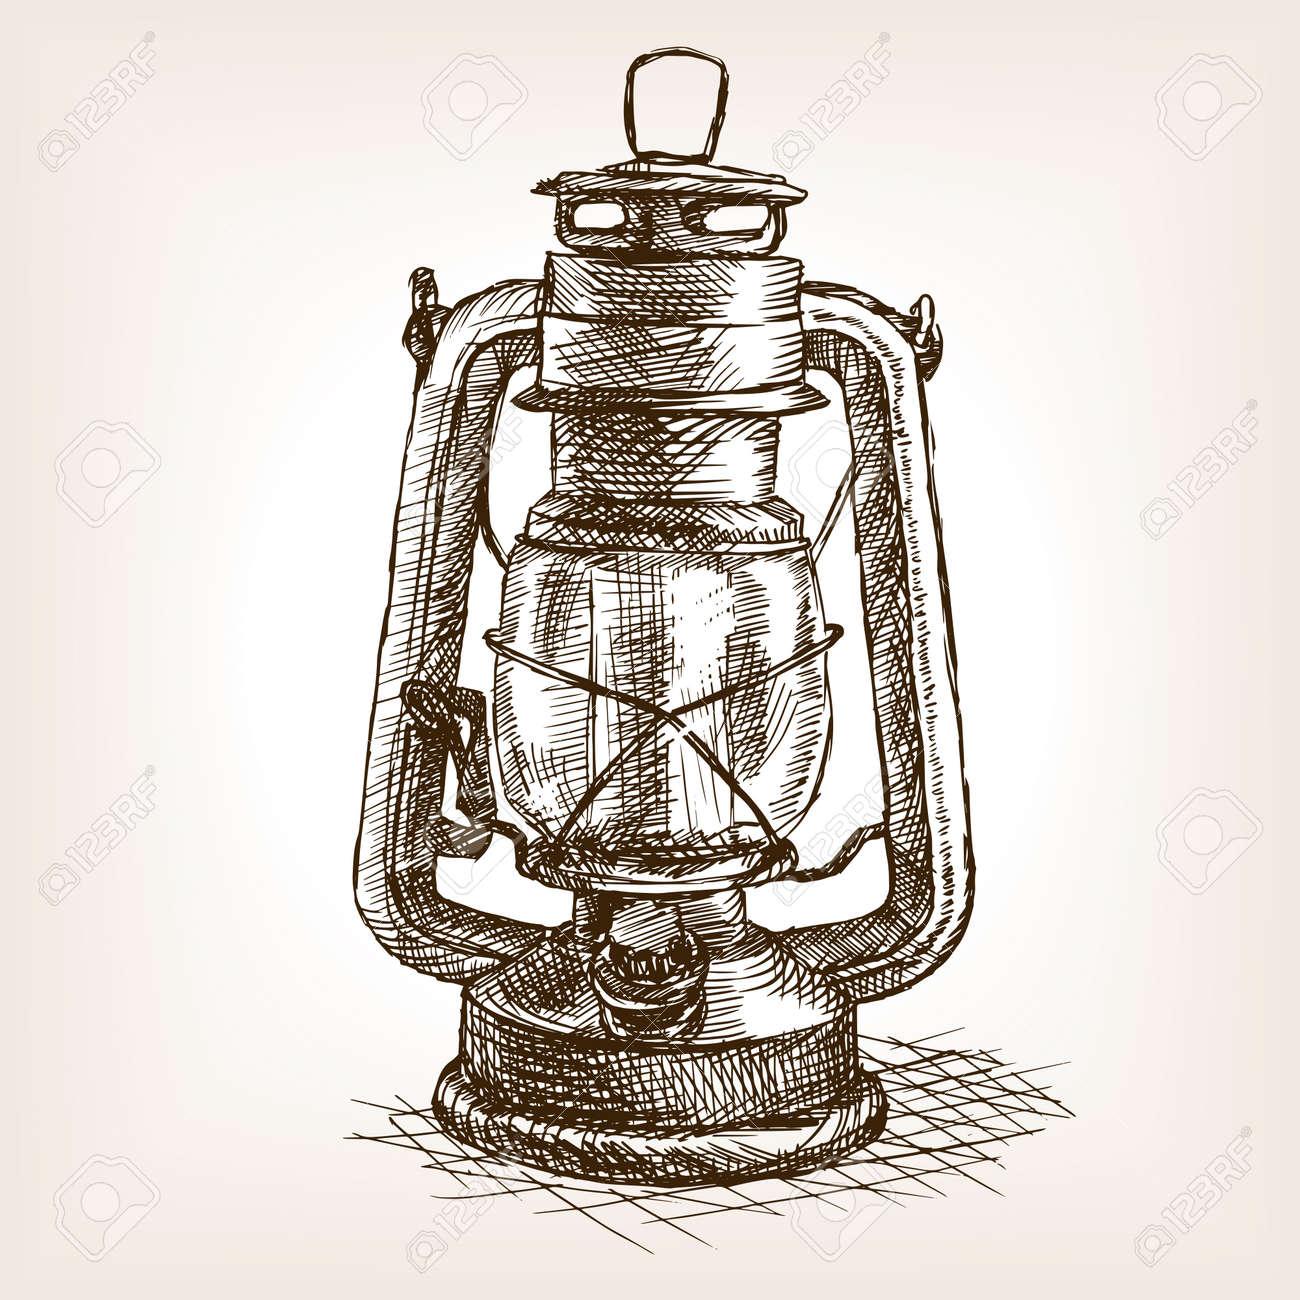 Vintage Lantern Sketch Style Vector Illustration Old Hand Drawn